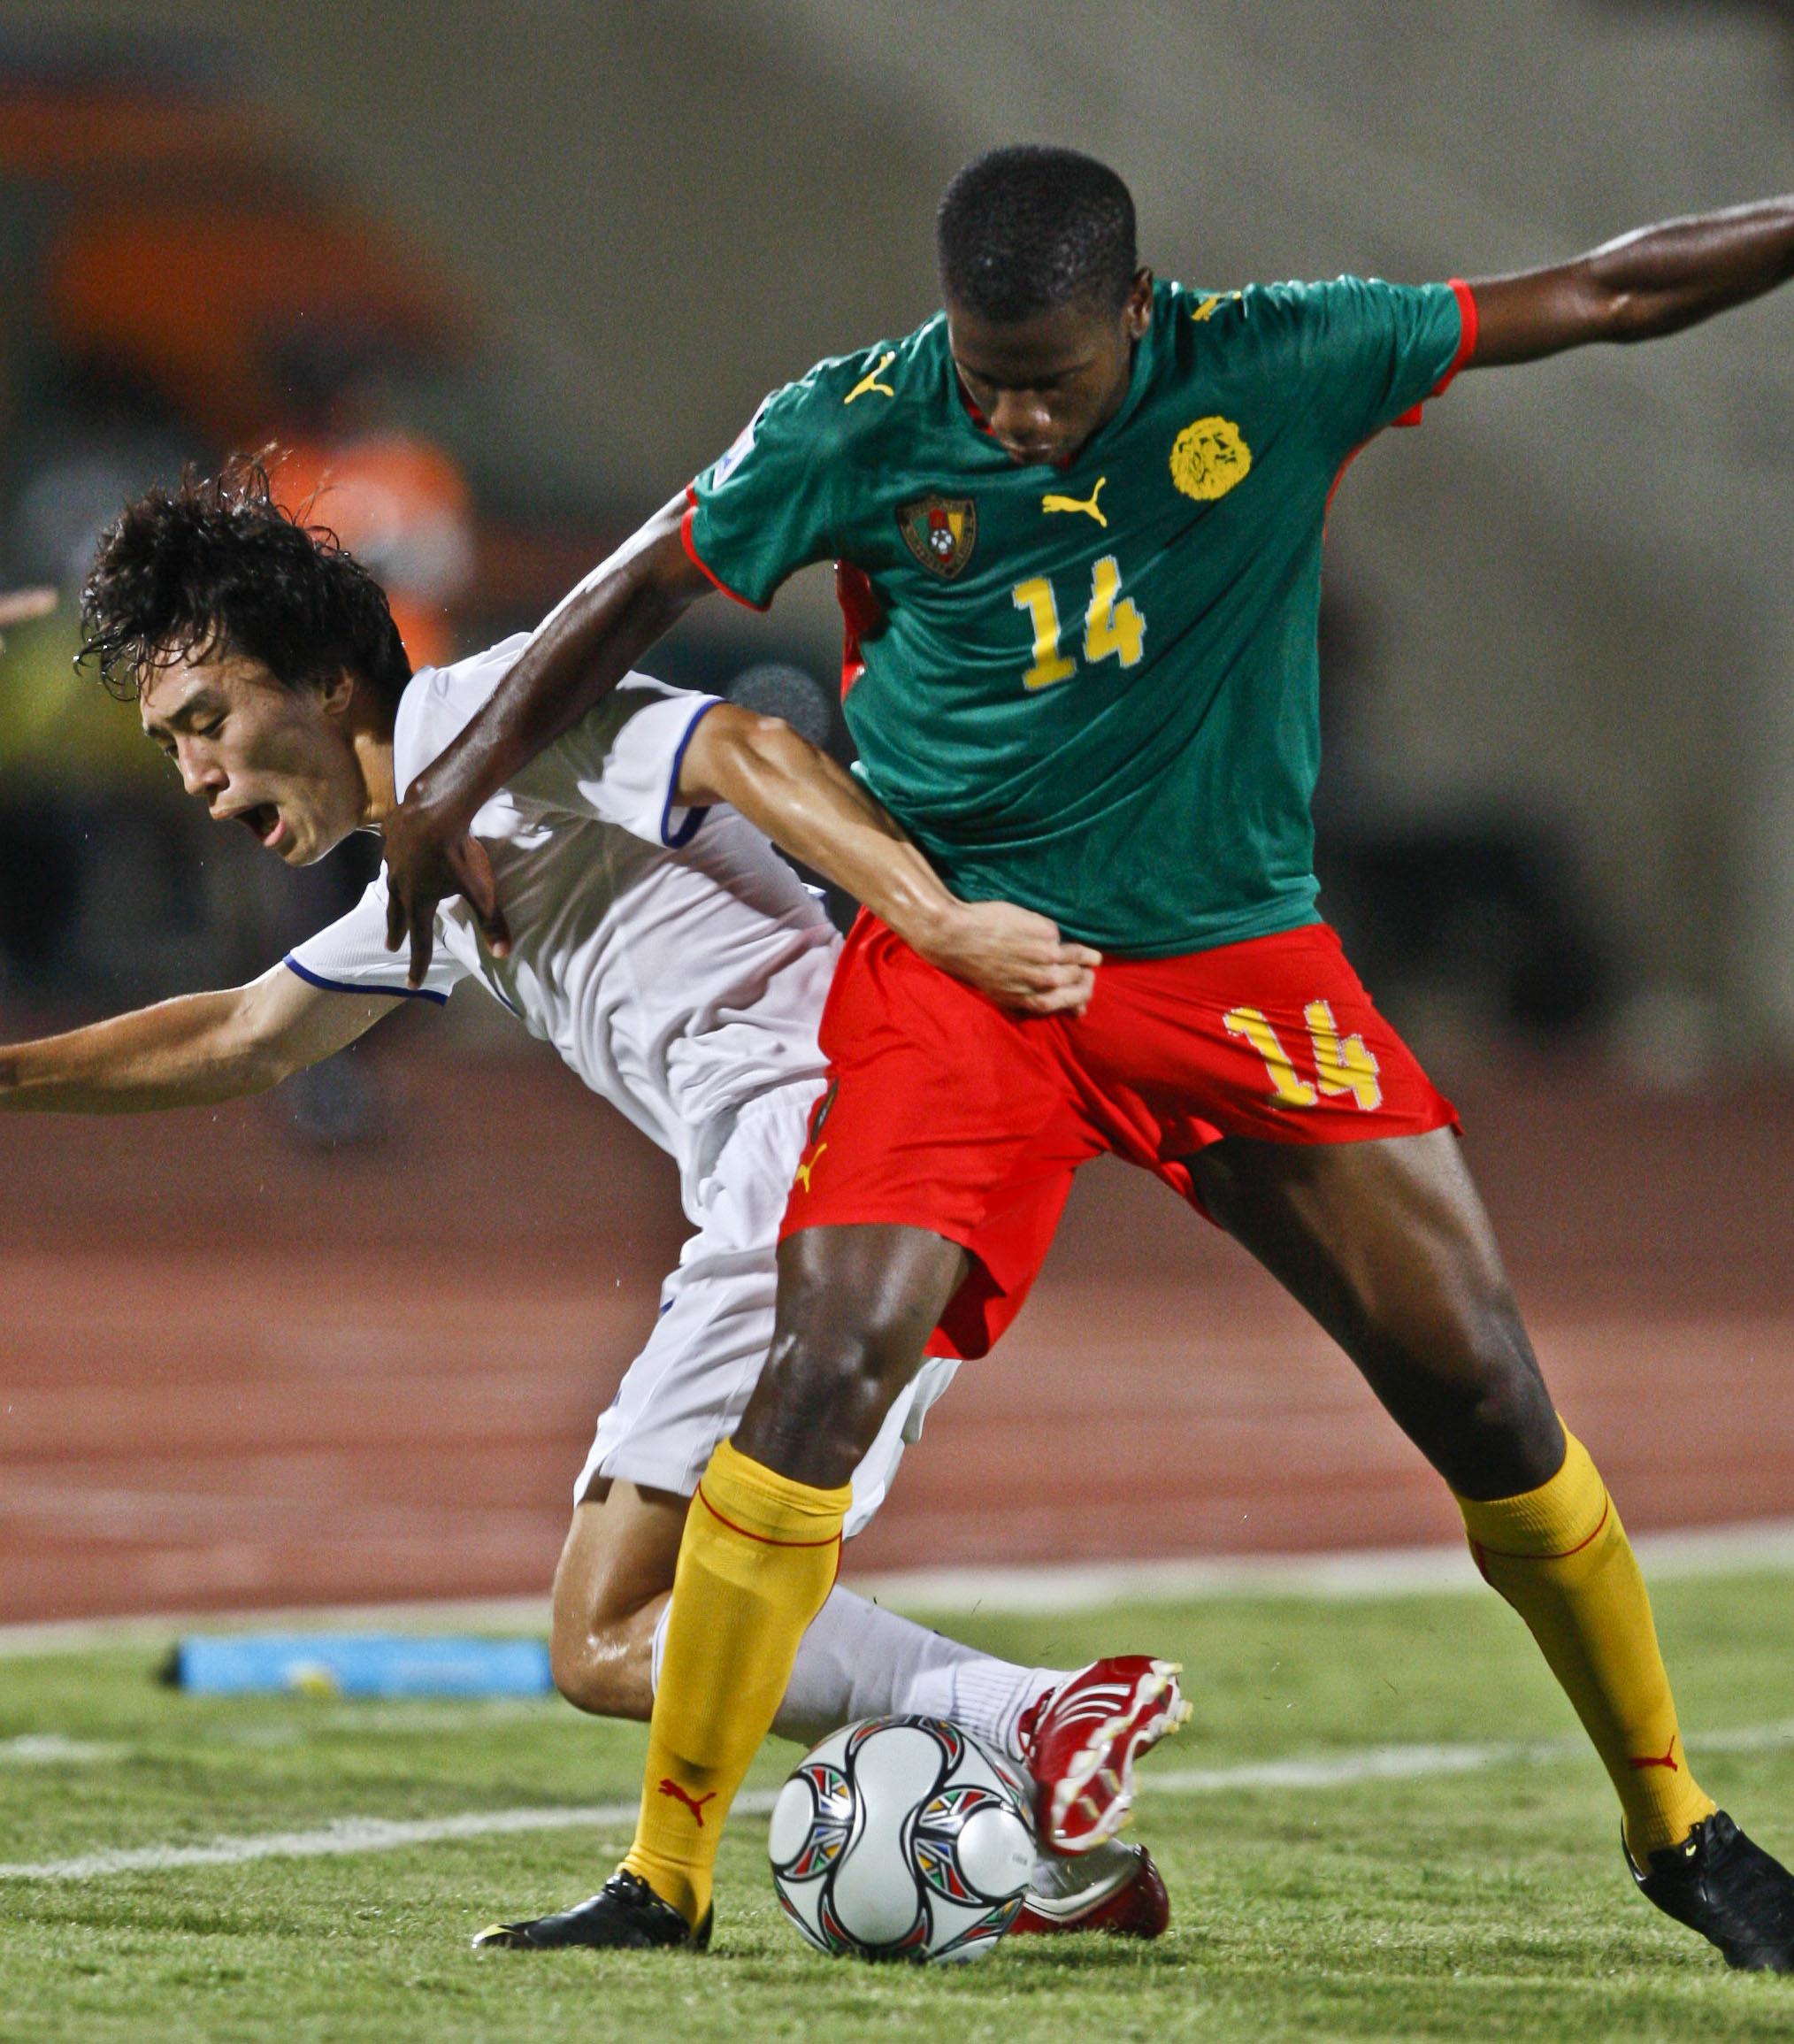 FILE - Cameroon's Patrick Ekeng (right) challenges Korea's Oh Jae Suk during their U-20 World Cup group C football match at the Suez Mubarak Stadium in Suez, Egypt,on Saturday, September 26, 2009. Photo: Nasser Nasser/AP